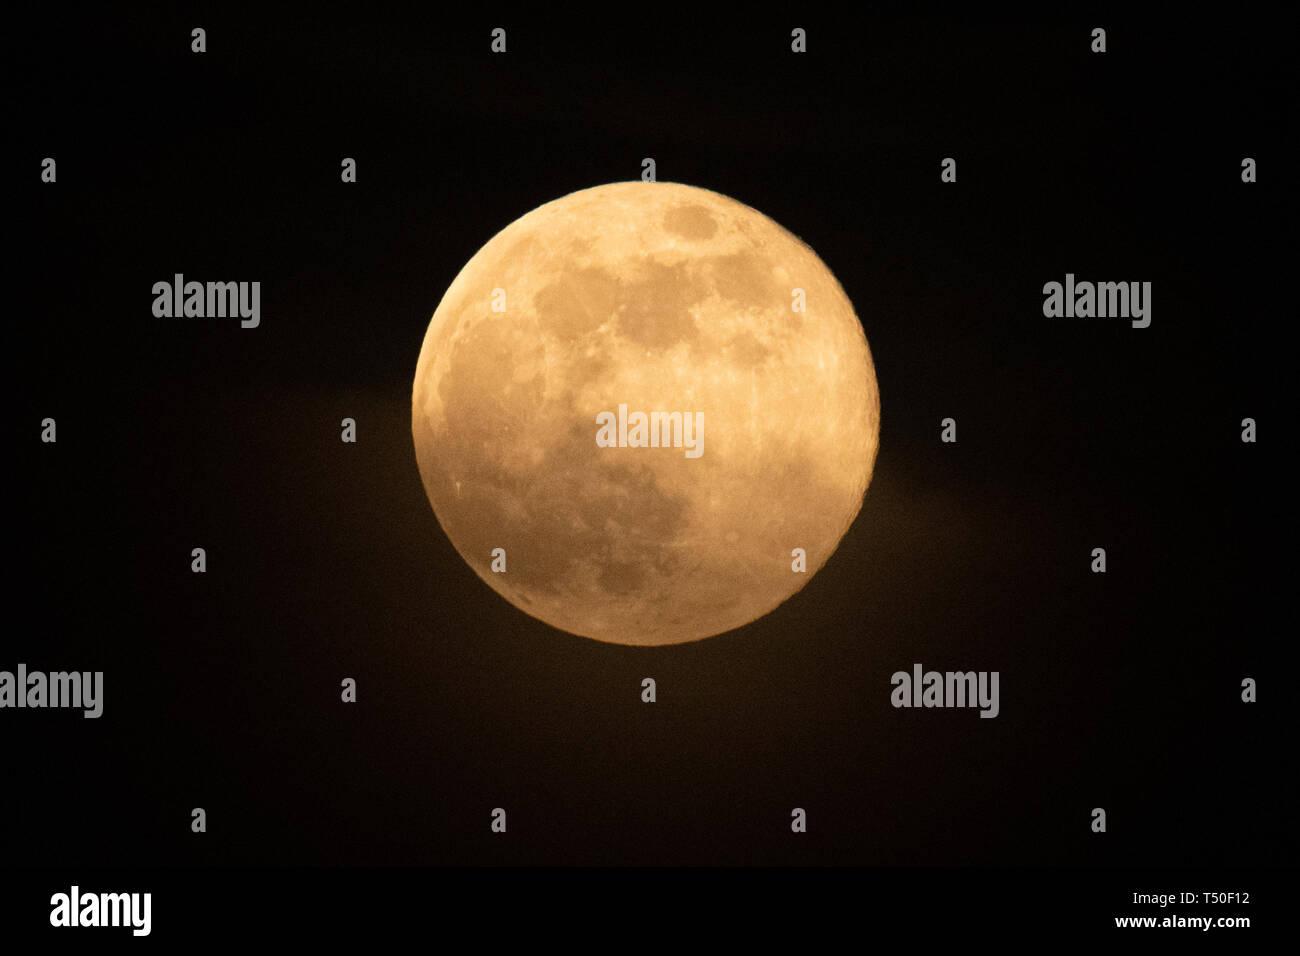 red moon tonight july 19 2019 - photo #15